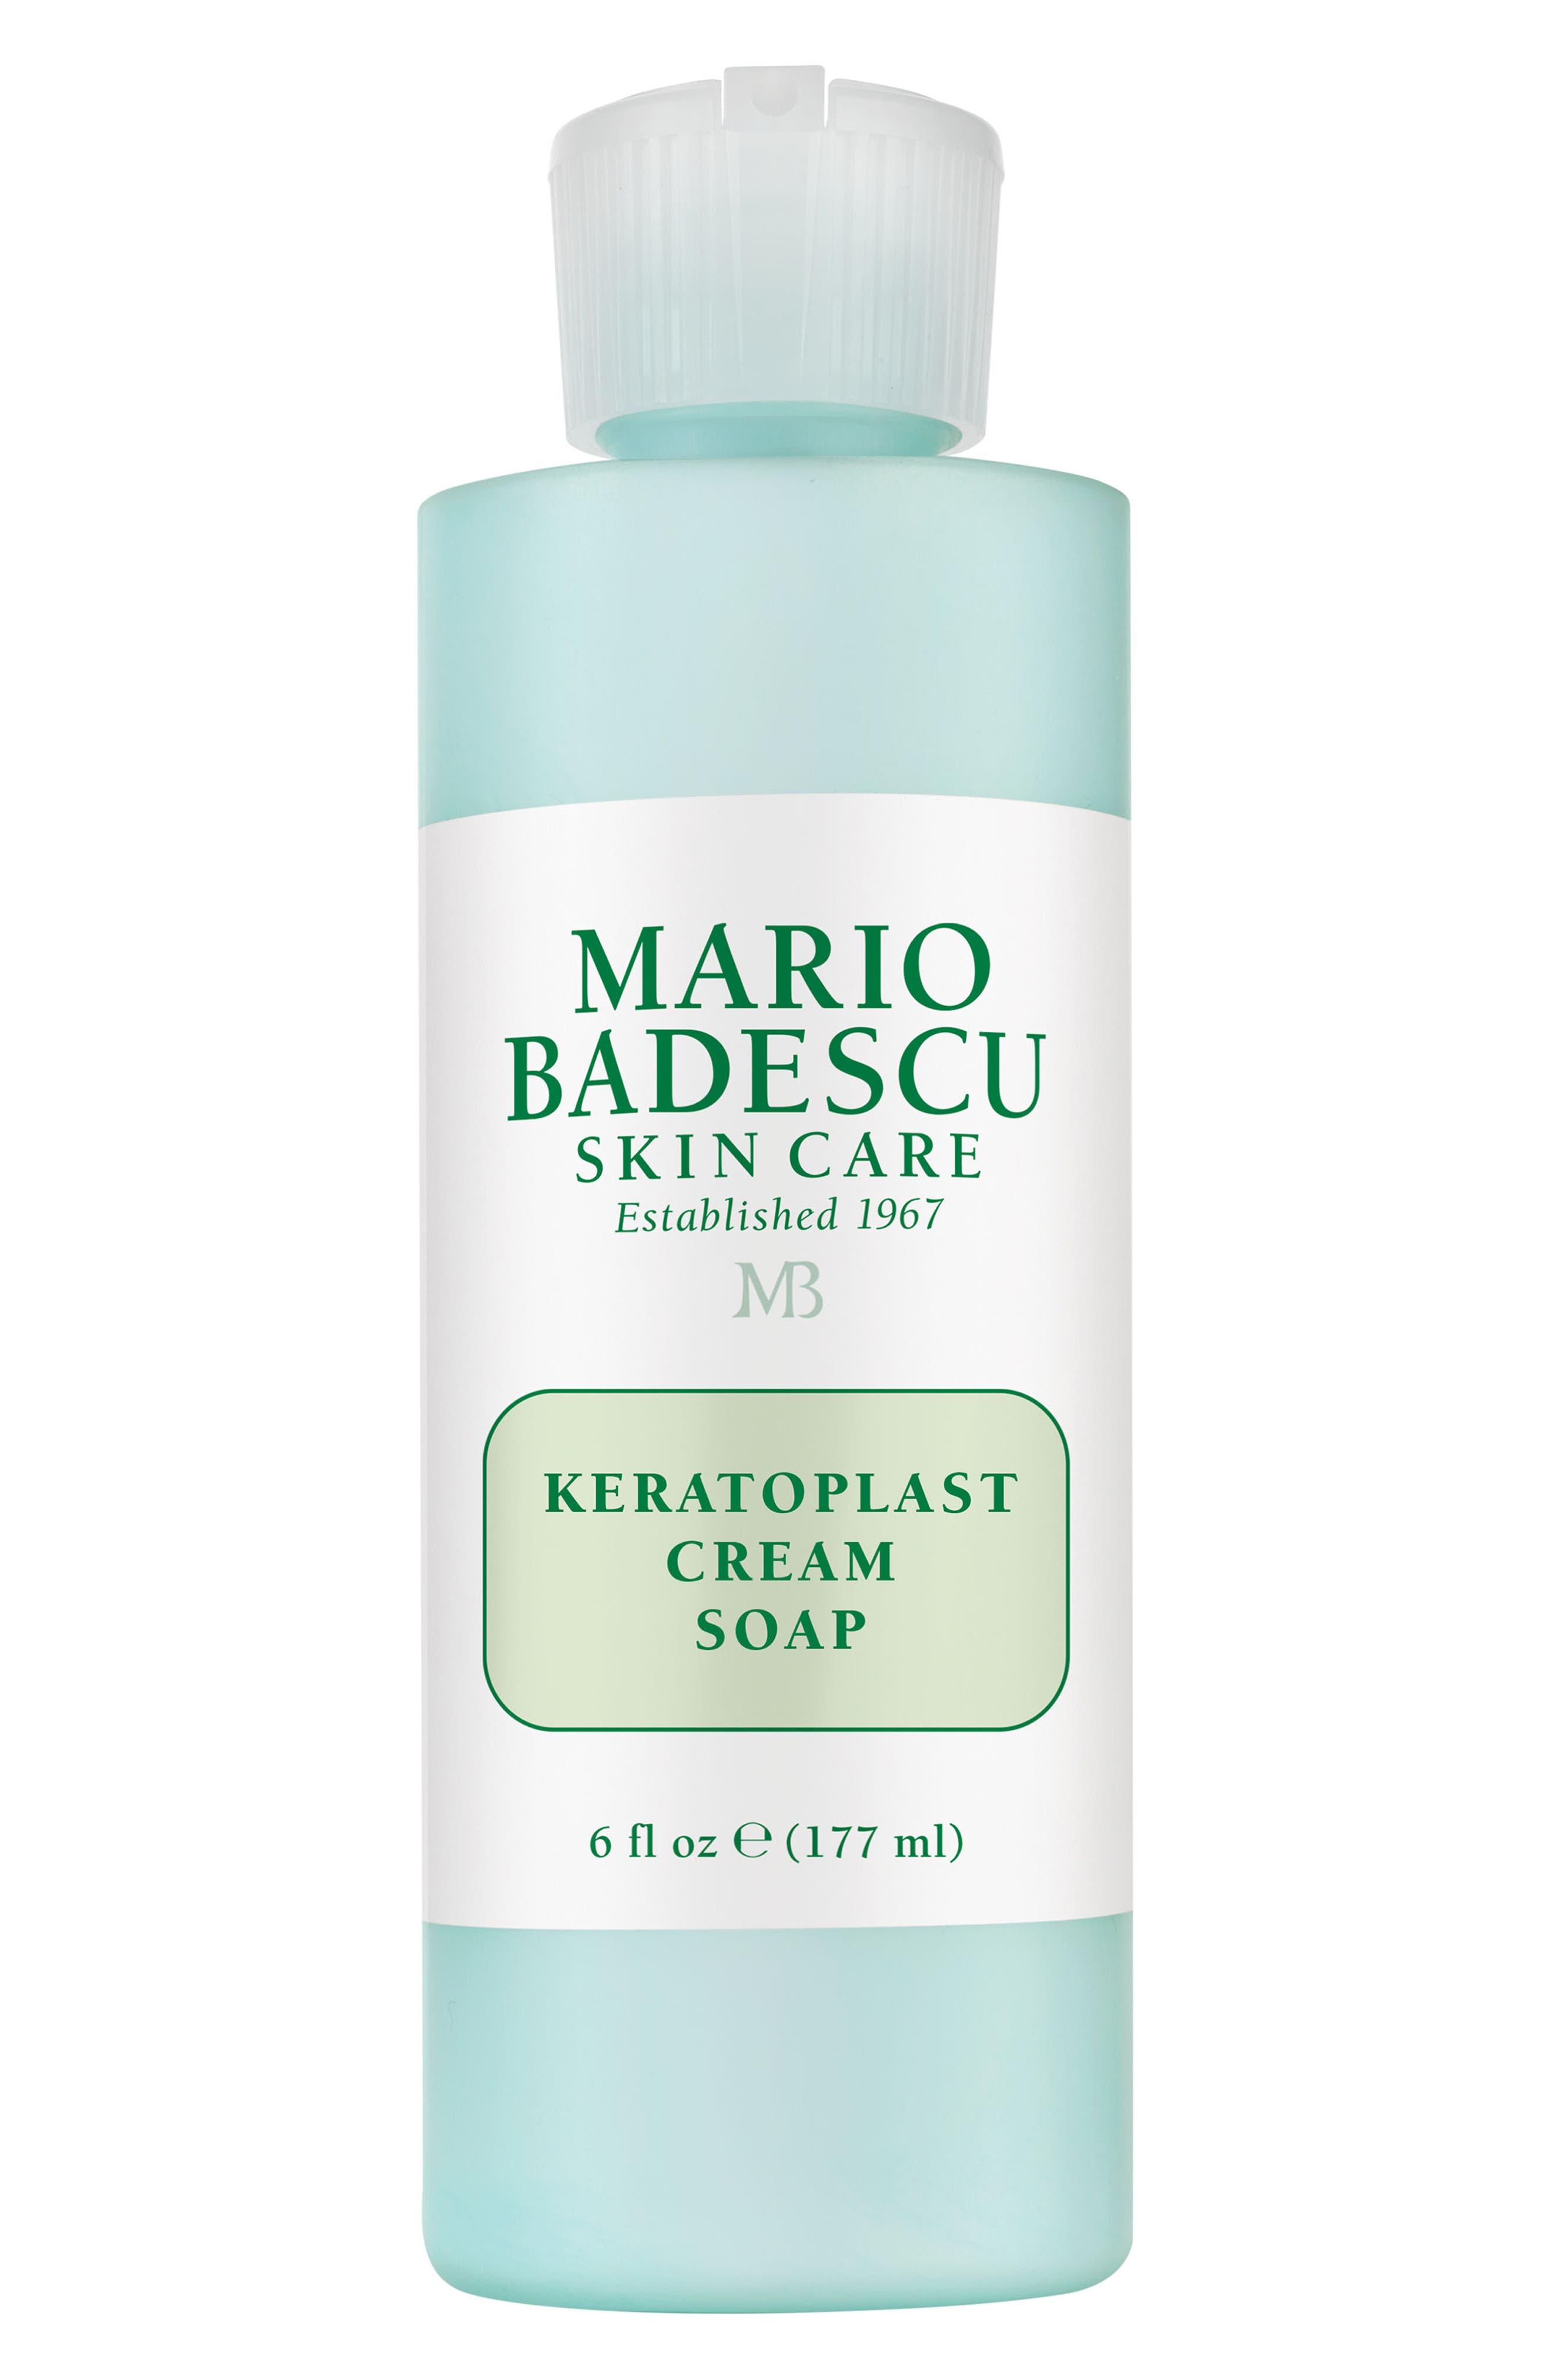 MARIO BADESCU, 'Keratoplast' Cream Soap, Main thumbnail 1, color, NO COLOR